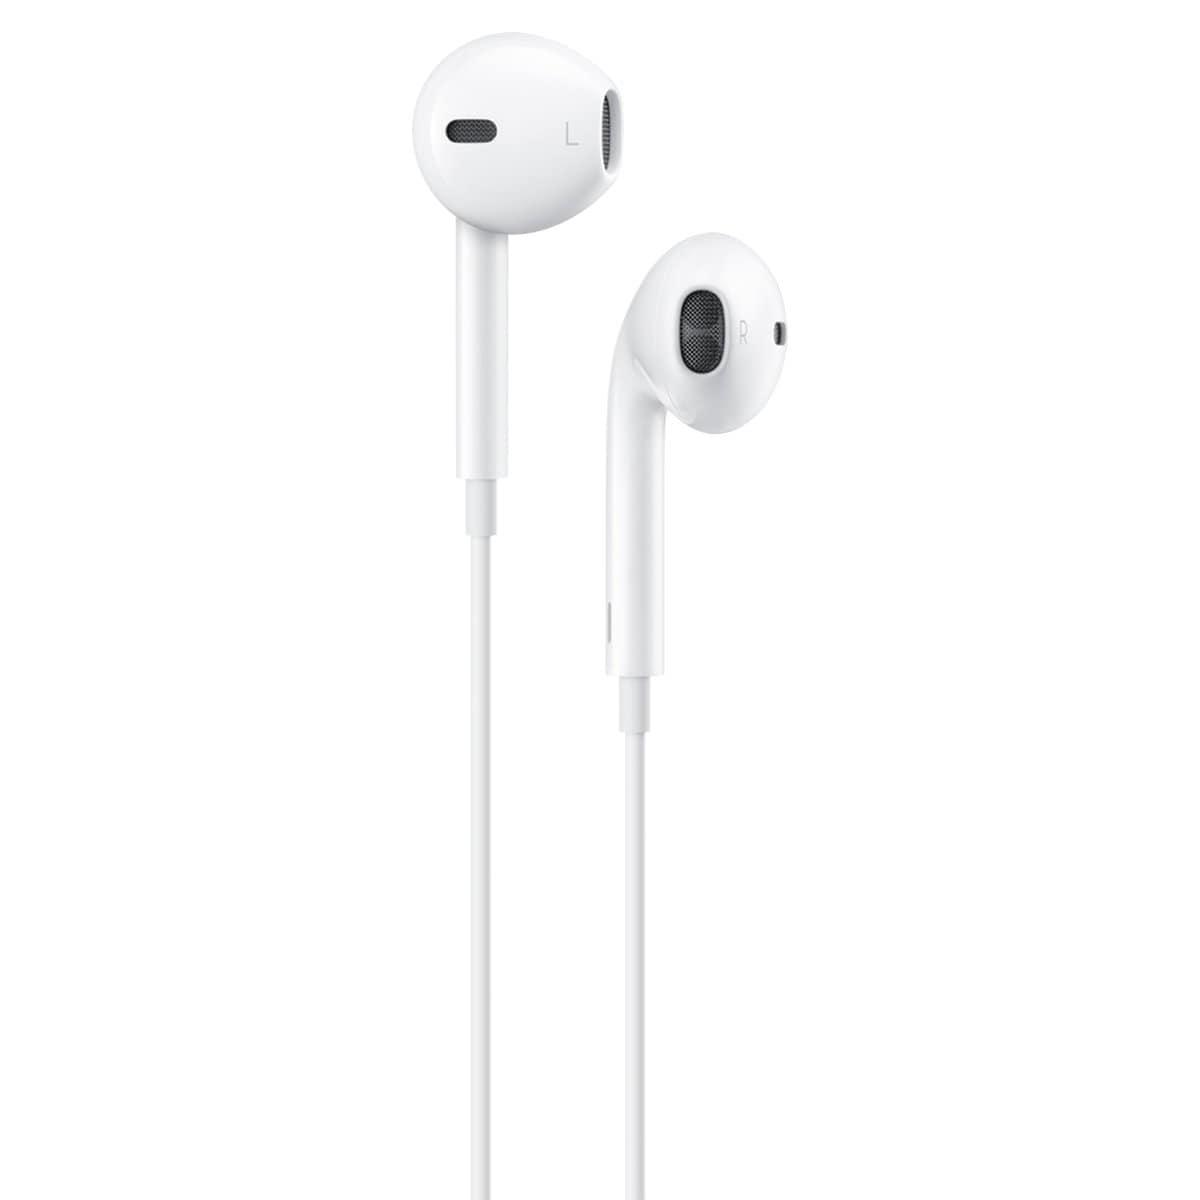 Audífonos Earpods con Micrófono Mnhf2Am Apple